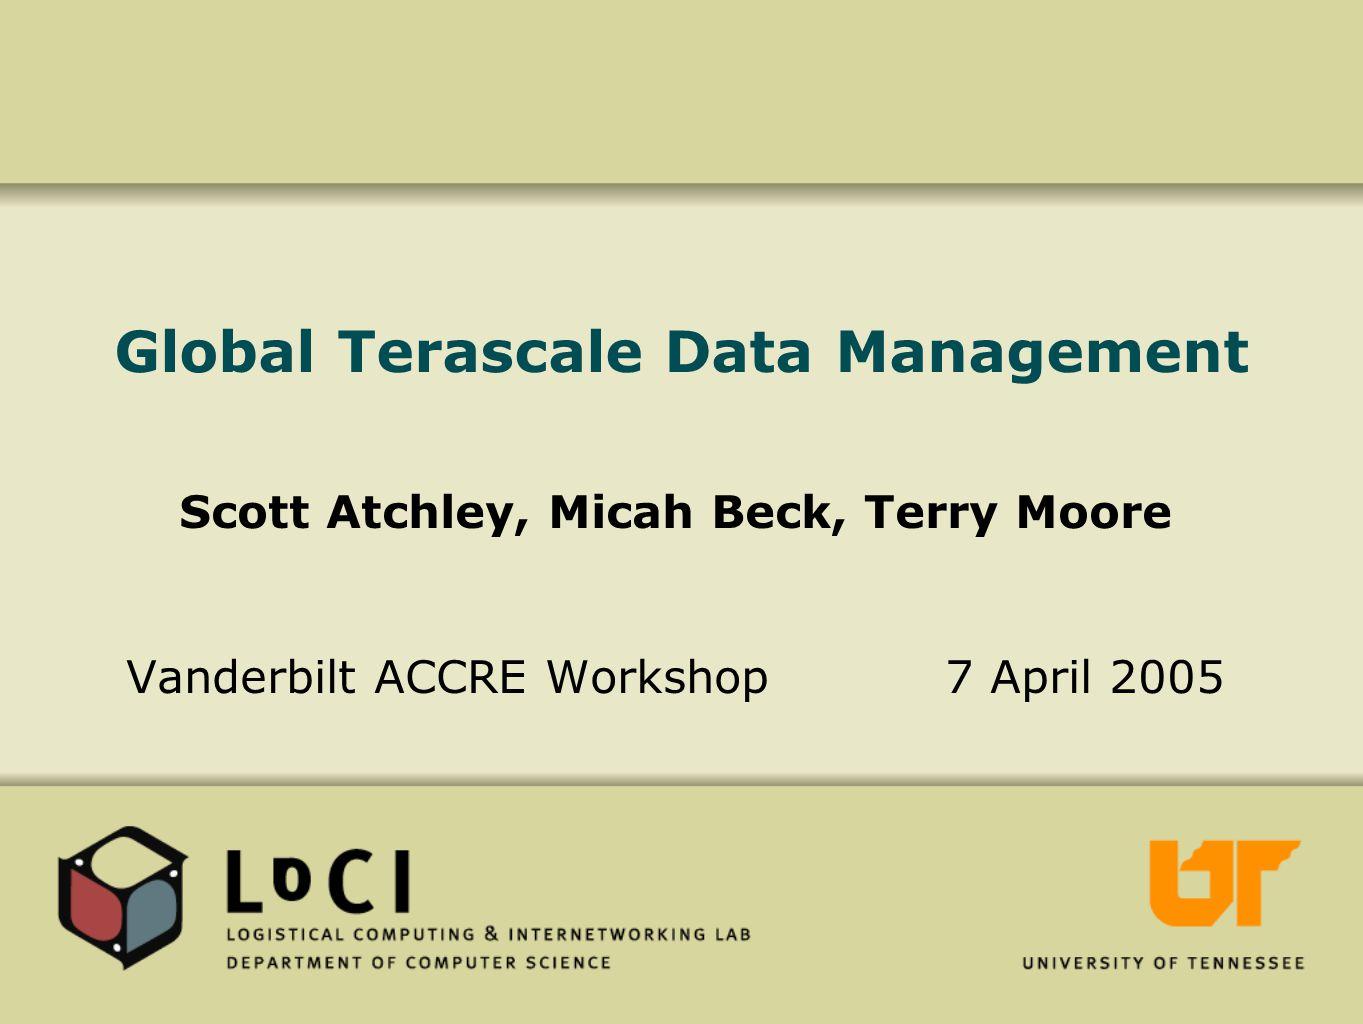 Global Terascale Data Management Scott Atchley, Micah Beck, Terry Moore Vanderbilt ACCRE Workshop 7 April 2005